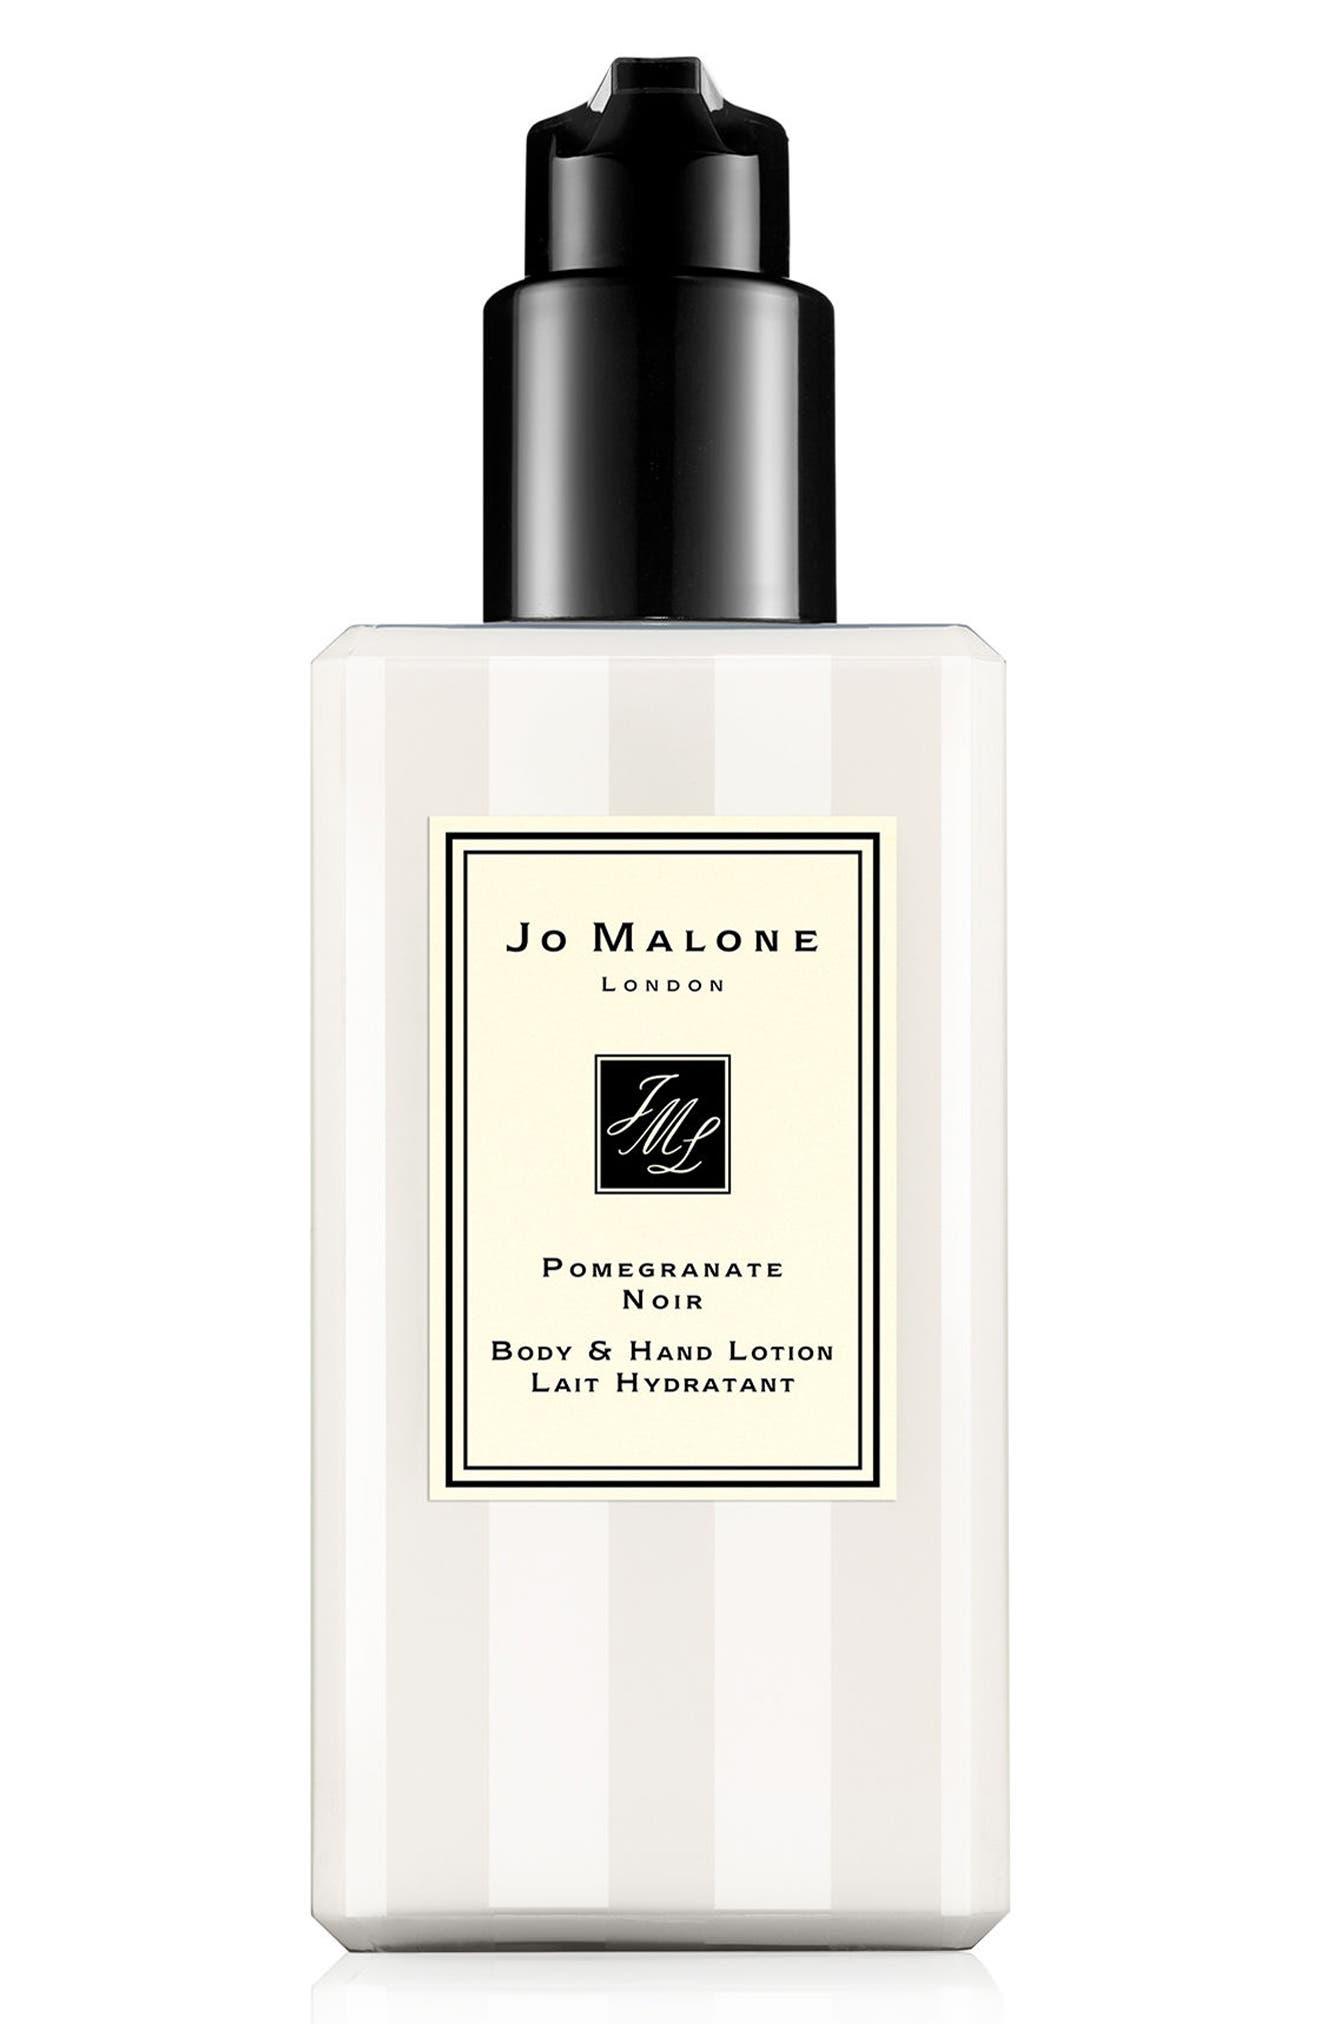 Jo Malone London(TM) Pomegranate Noir Body Lotion